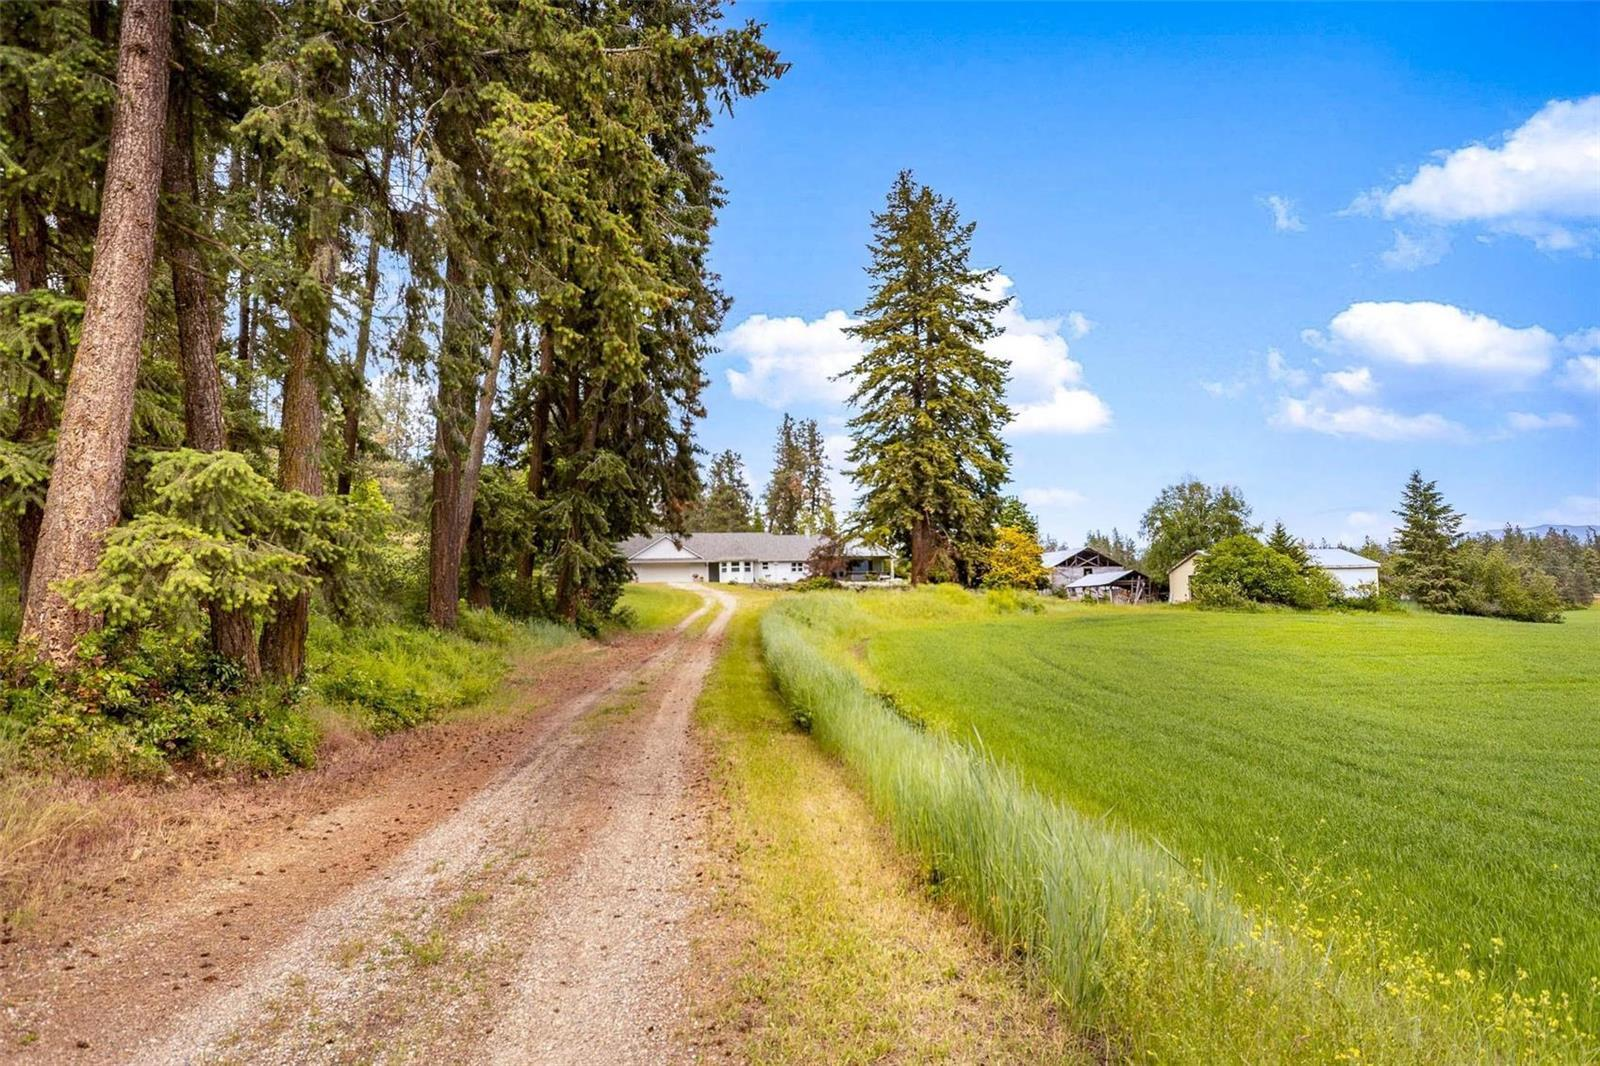 4602 Schubert Road,, Armstrong, British Columbia  V0E 1B4 - Photo 3 - 10232684